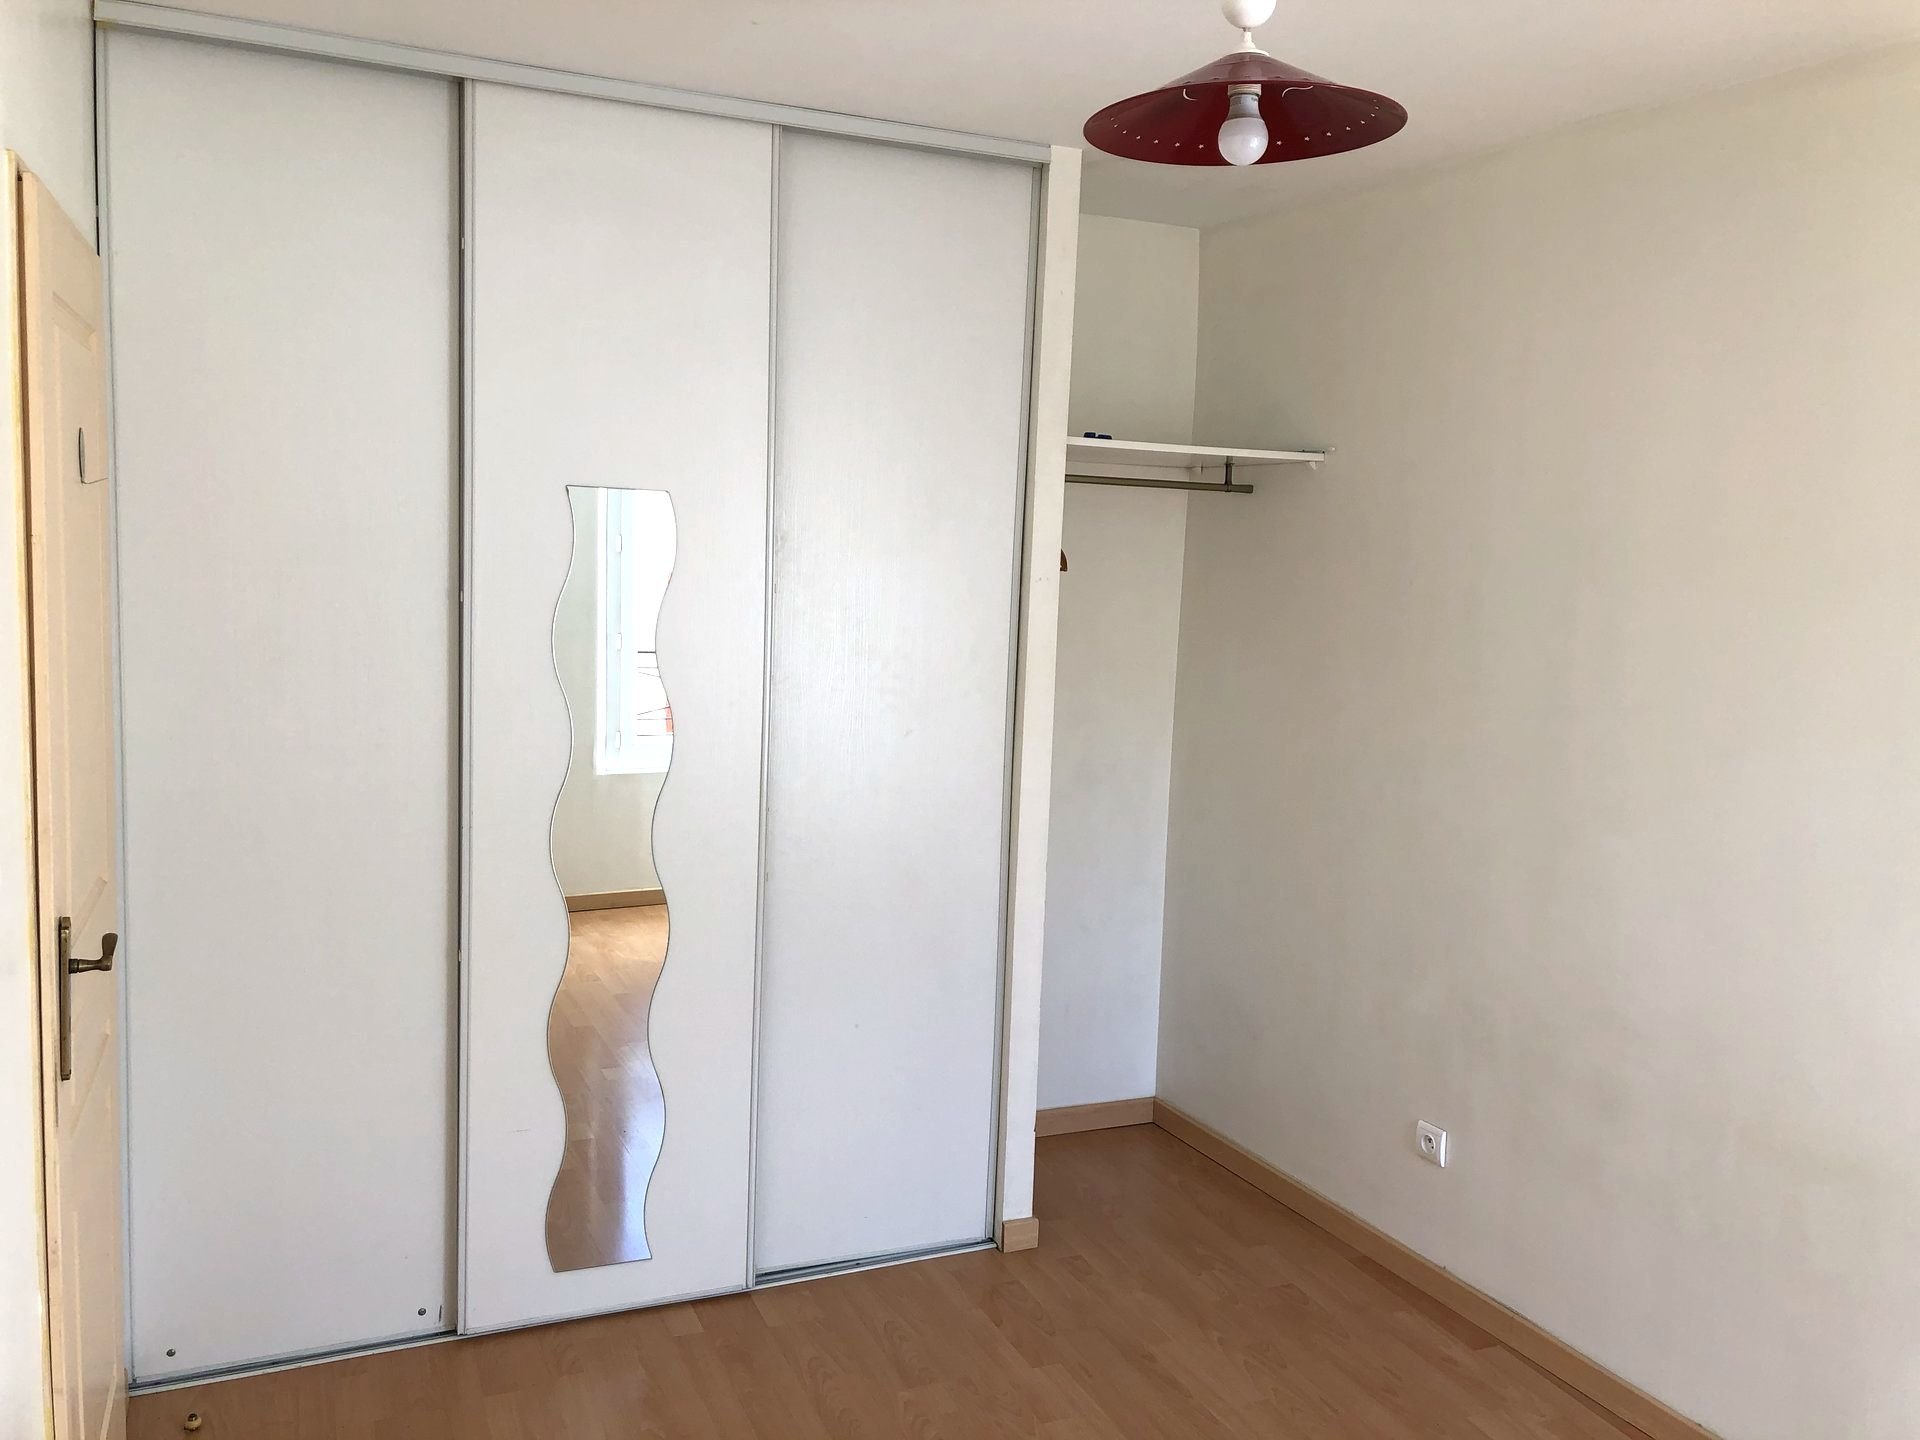 T2 42 m2 Plan de Meyreuil